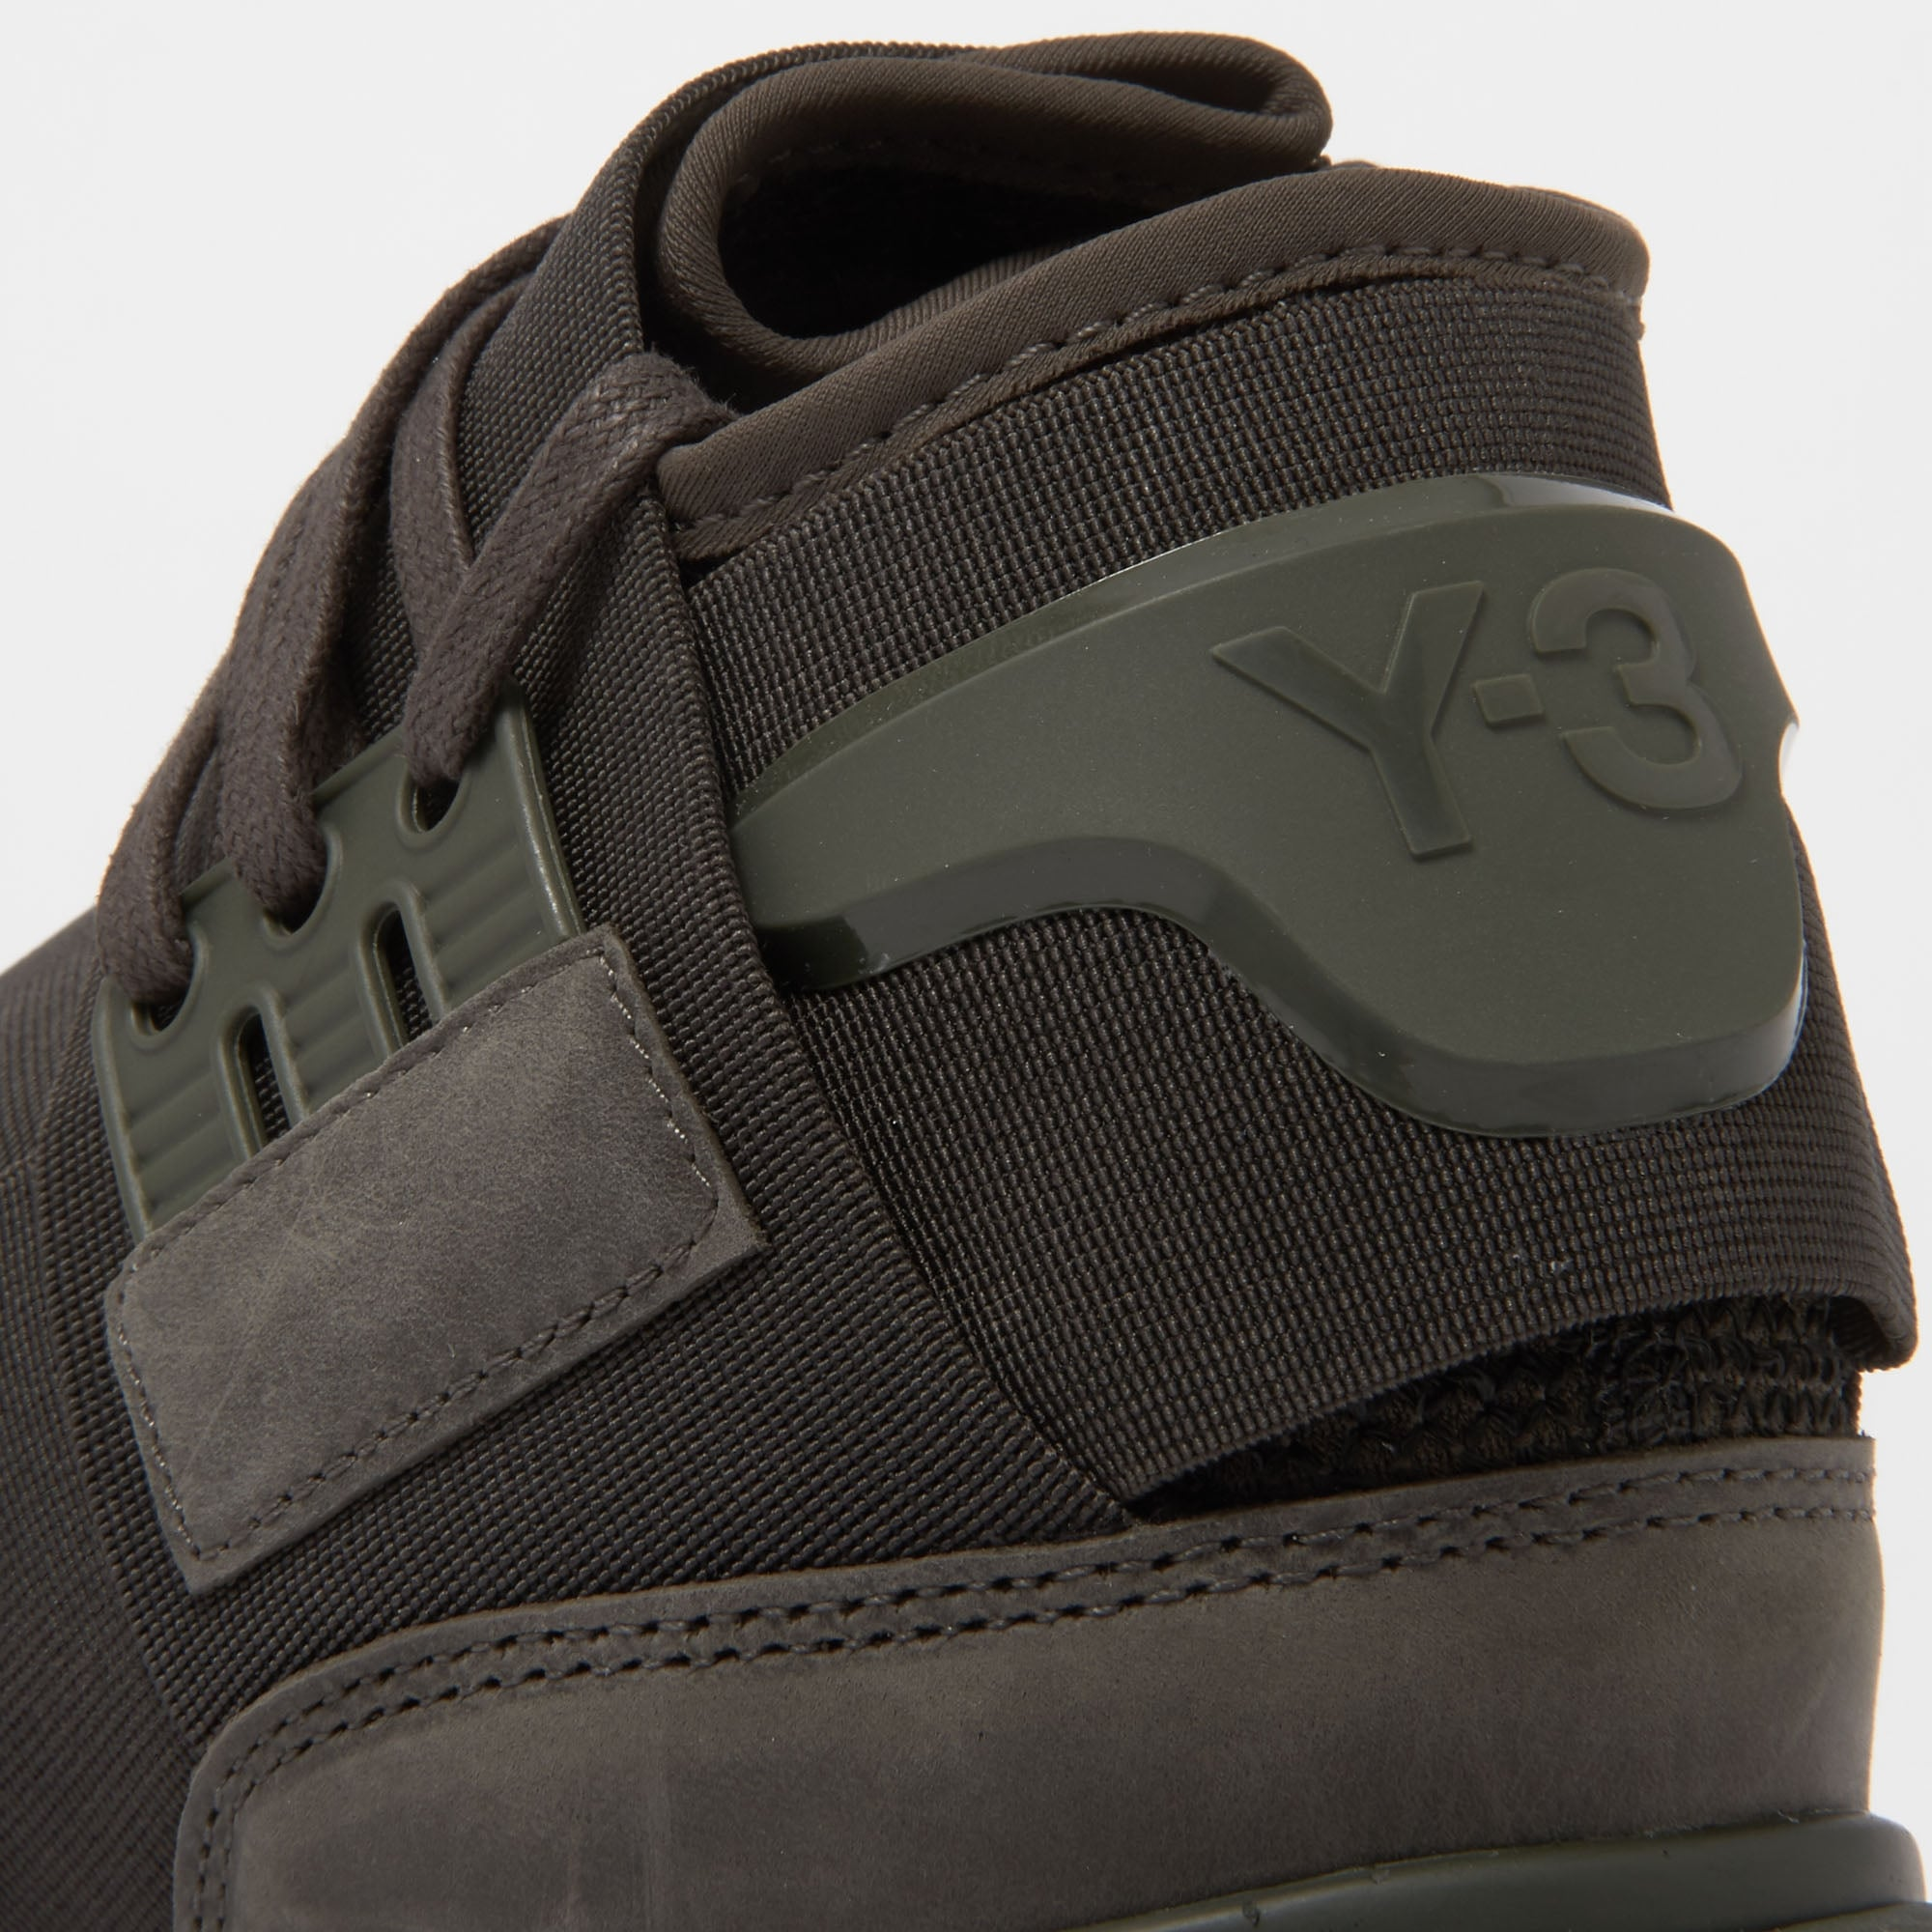 3b35bee688bf Qasa High Black Olive Sneakers CG3194 · Adidas Y-3 ...